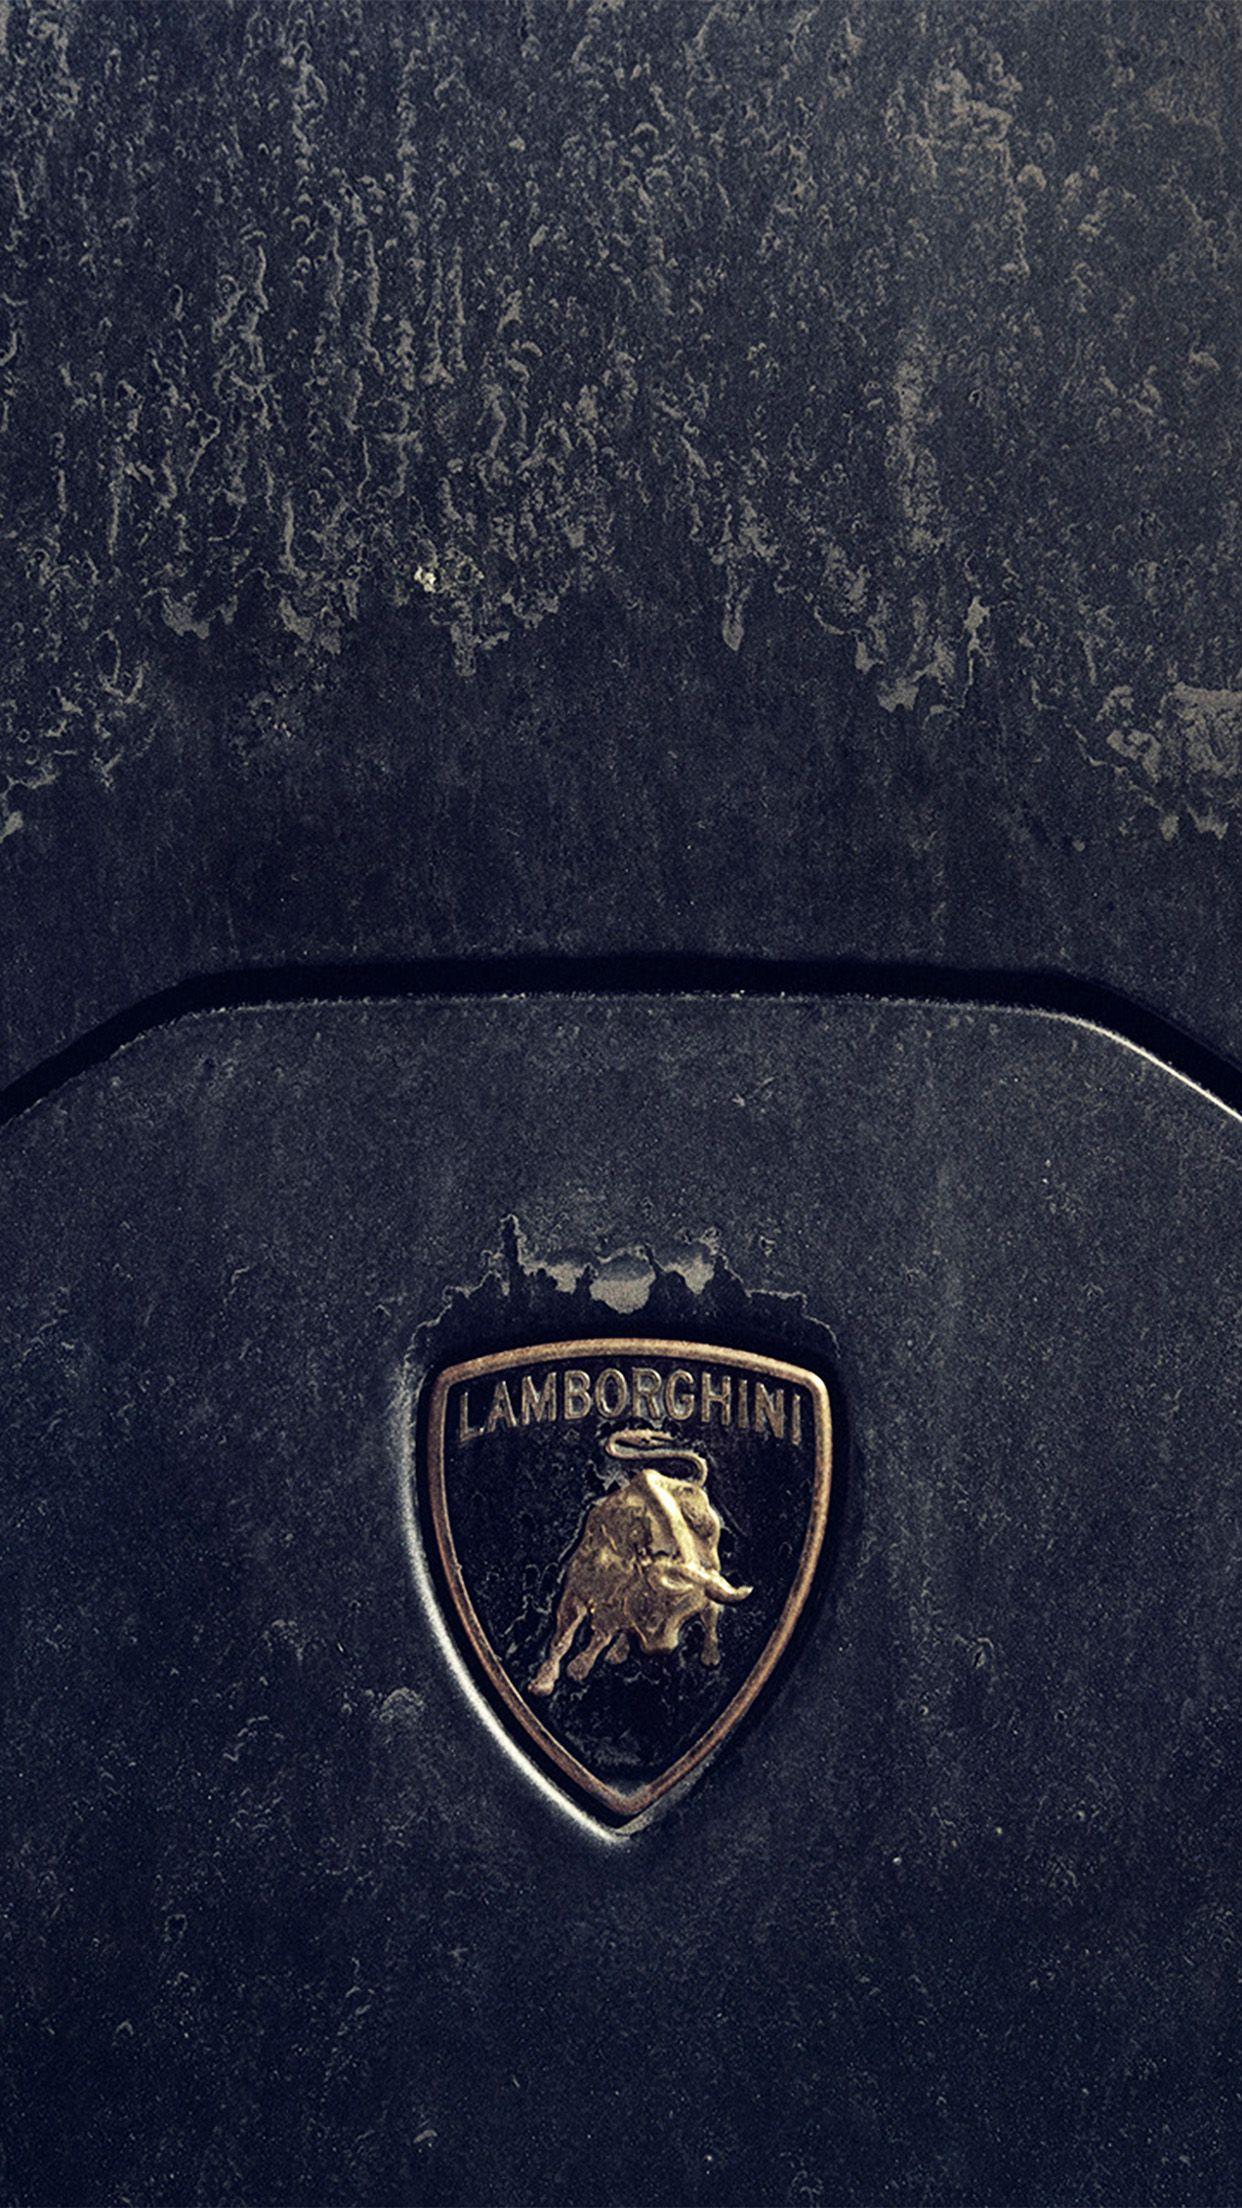 Lamborghini Logo iPhone Wallpapers